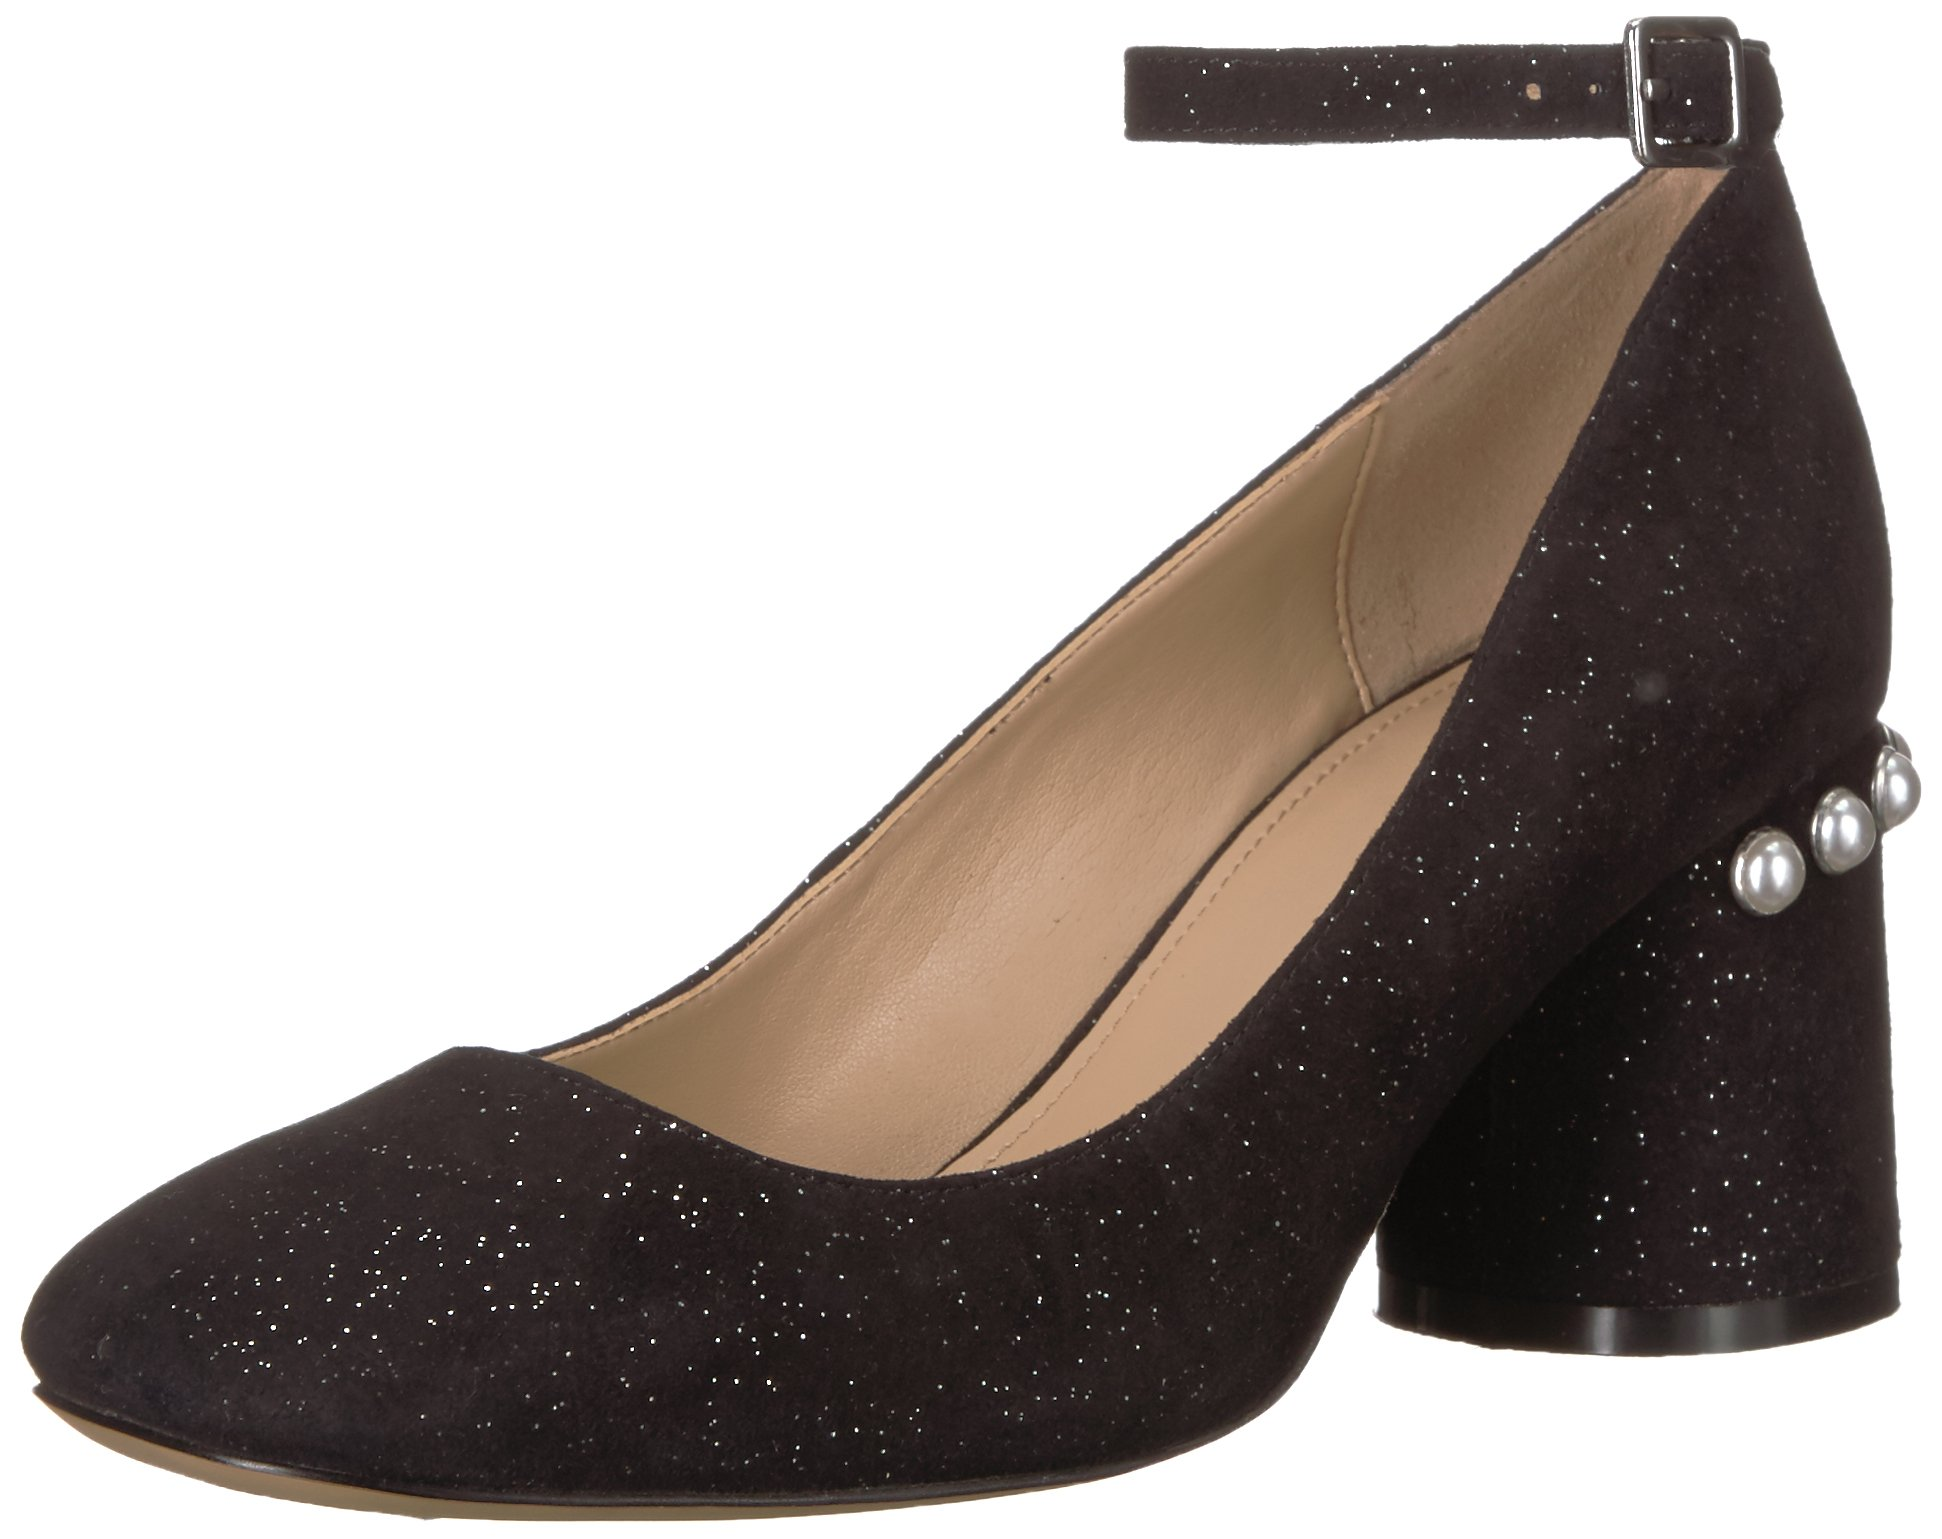 The Fix Women's Mona Embellished Block Heel Ankle-Strap Pump, Black, 7.5 B US